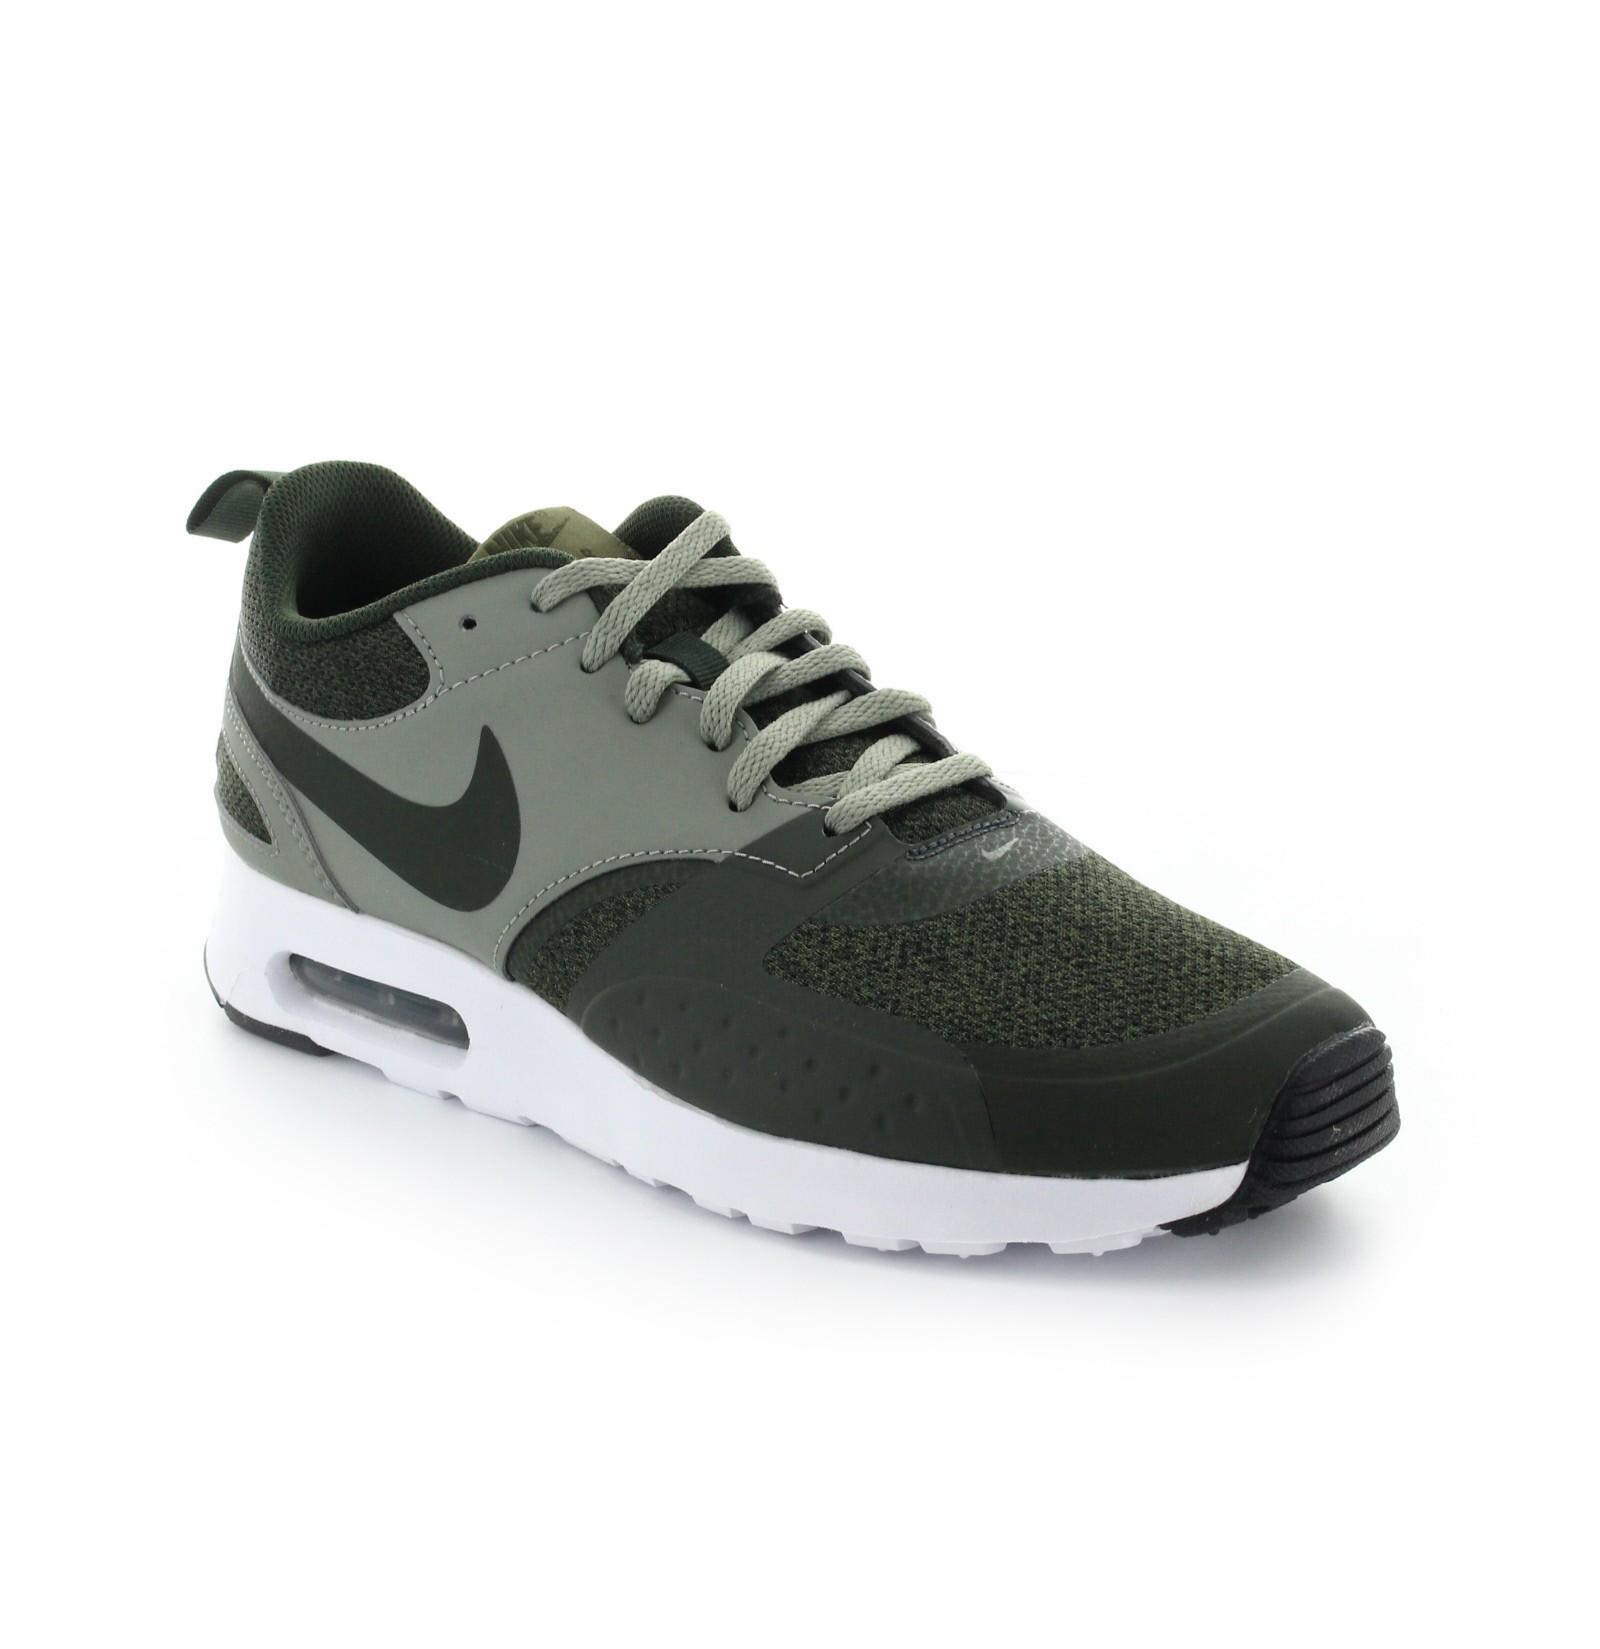 bb642864753 sneakers retro running Nike air max vision se - Маратонки - Обувки ...